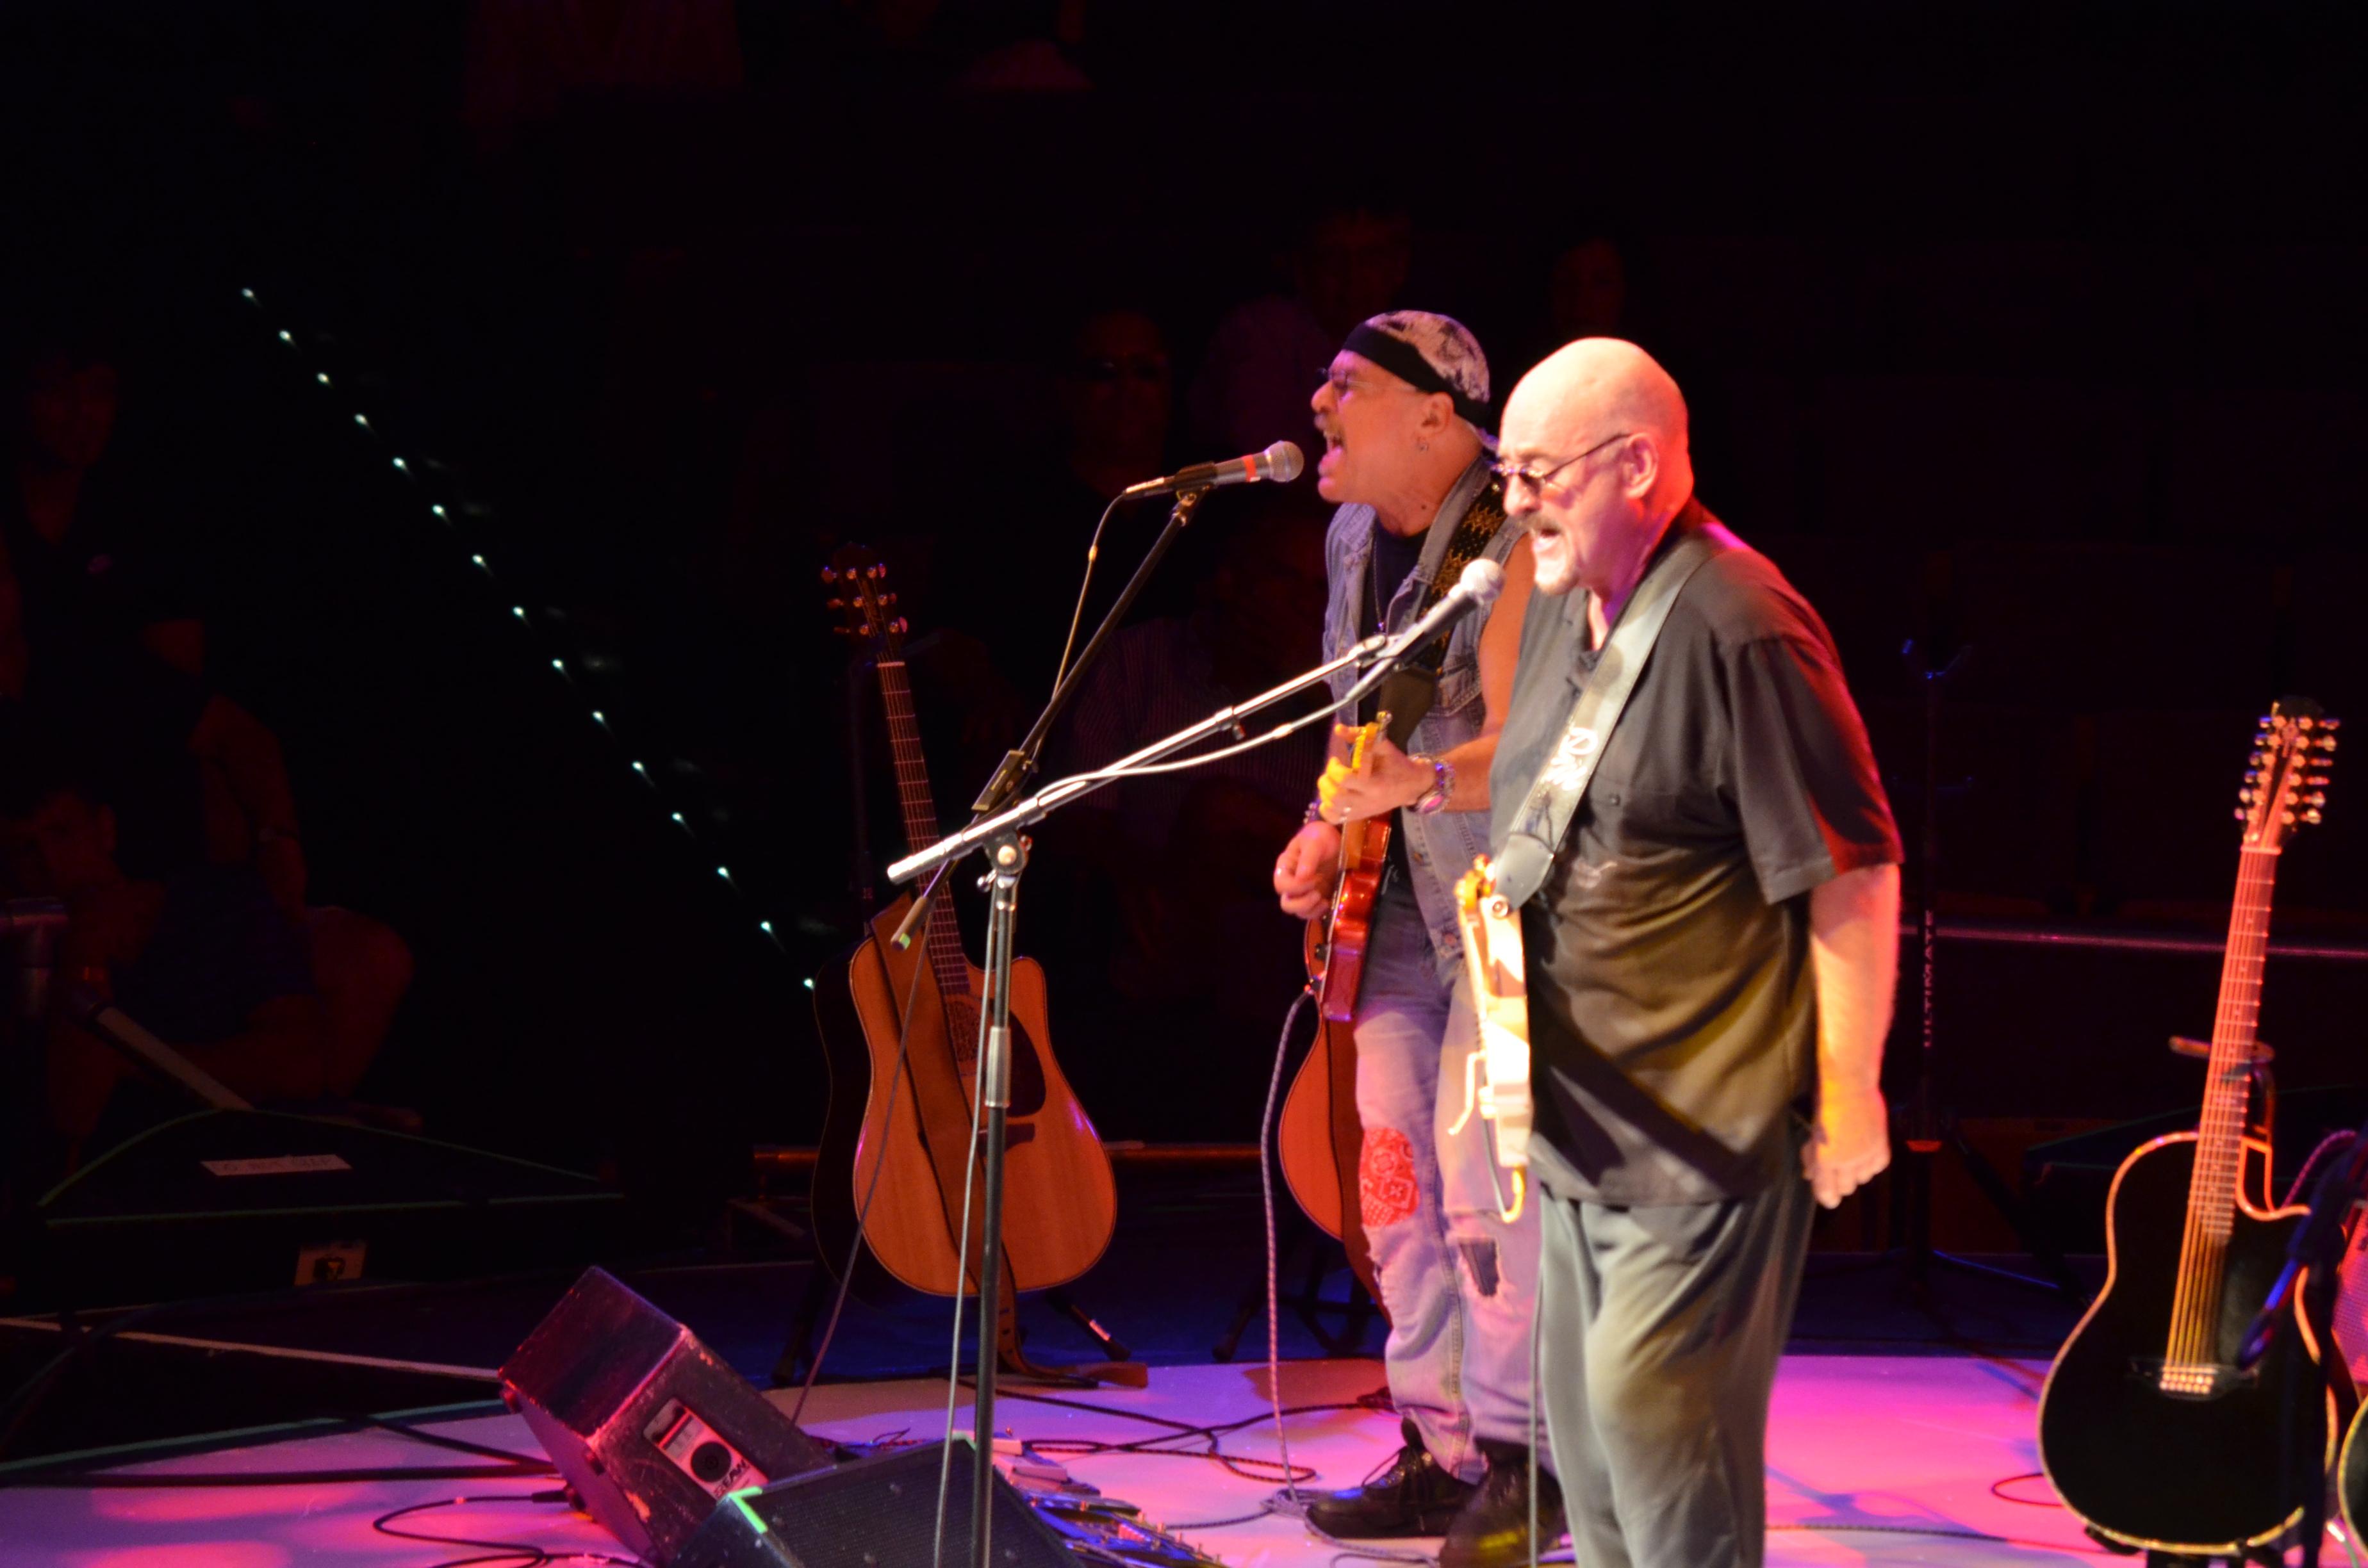 Dave Mason Westbury 09-09-11 #4